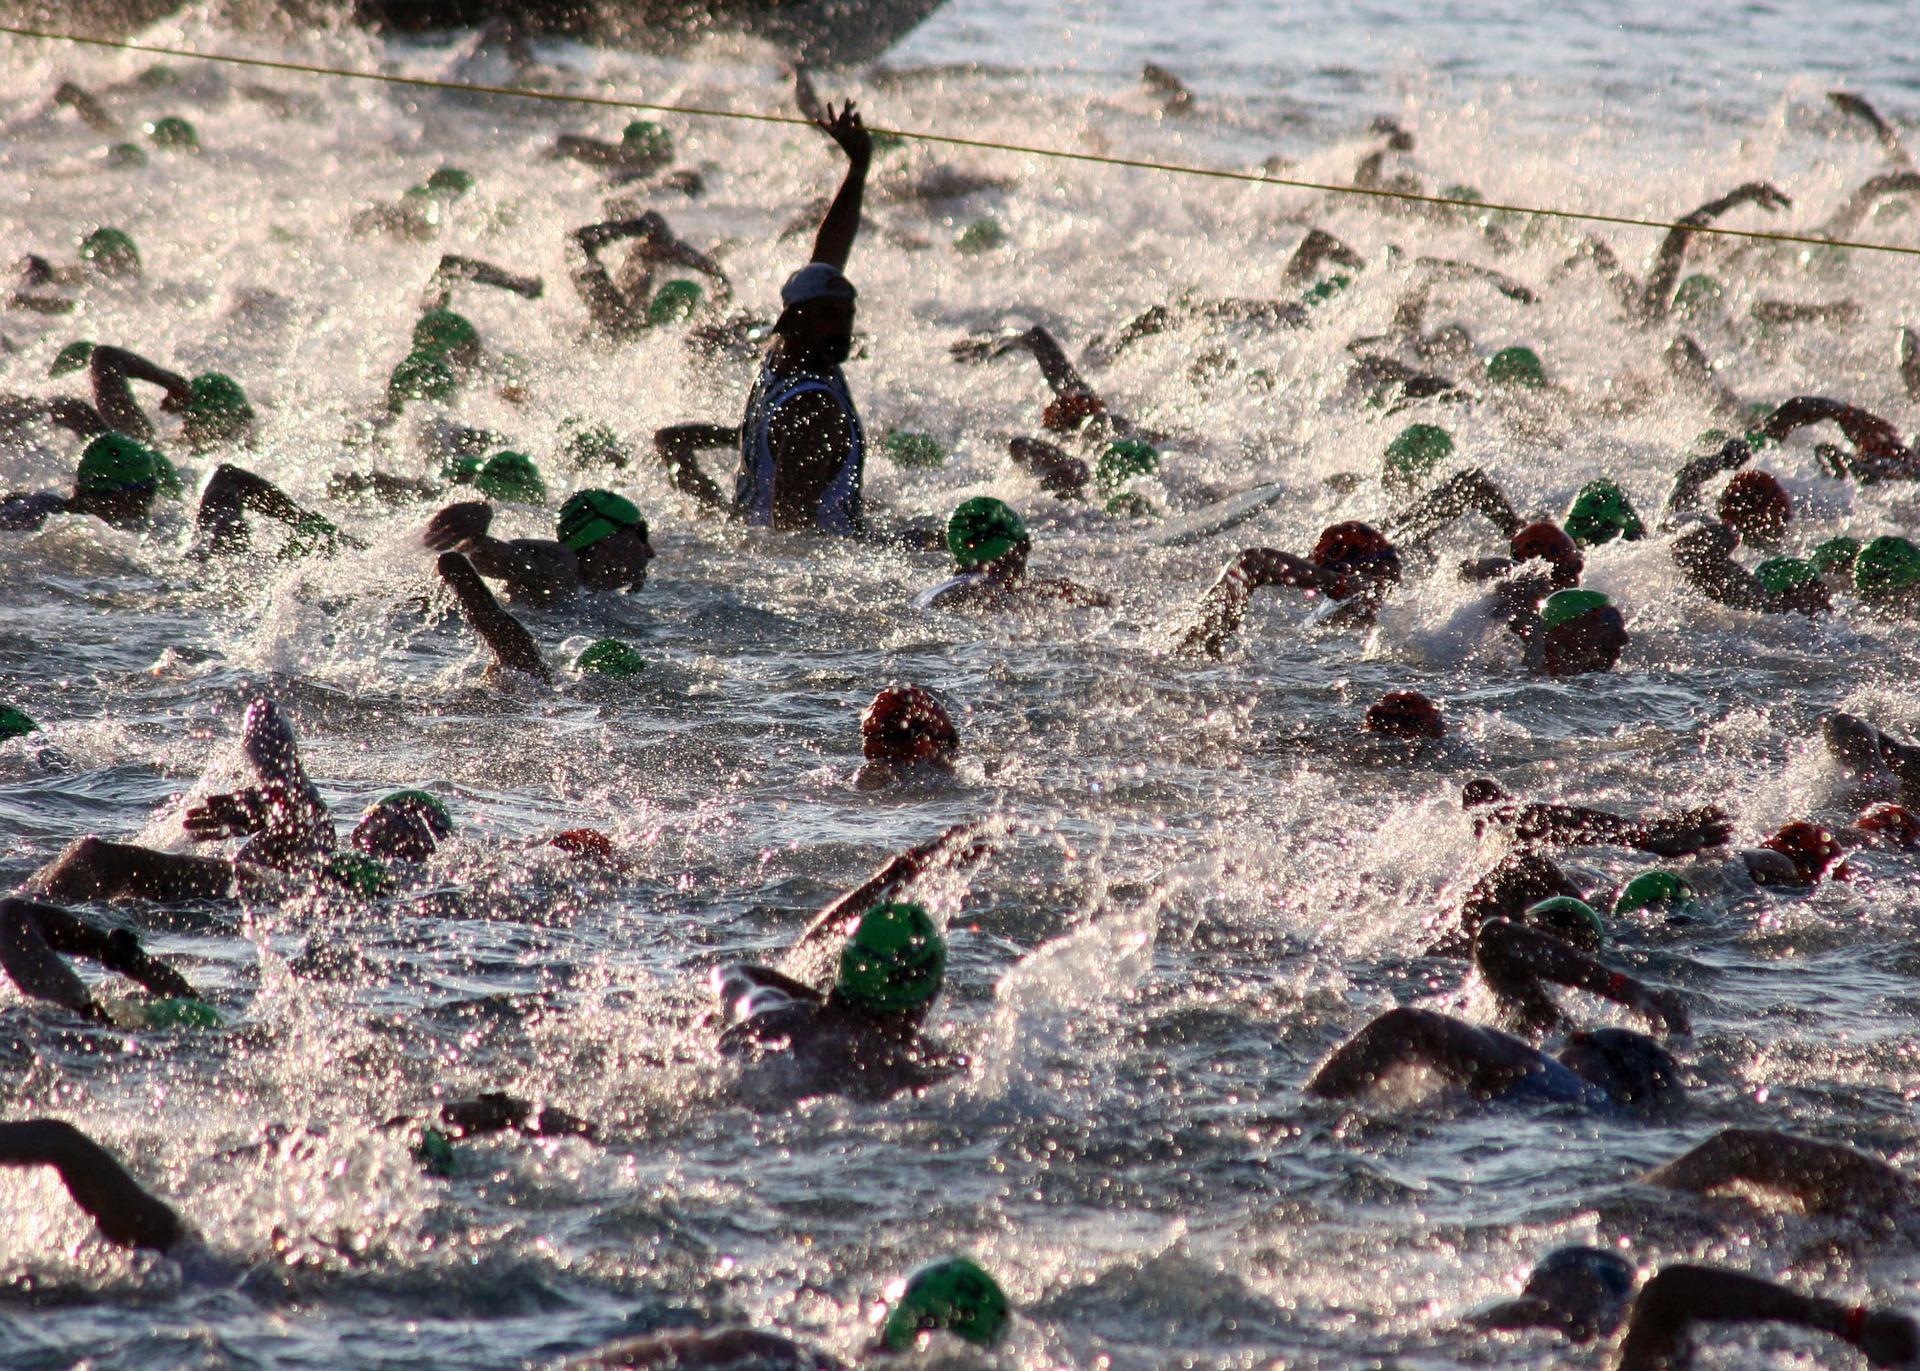 triathalon-swim-618742_1920